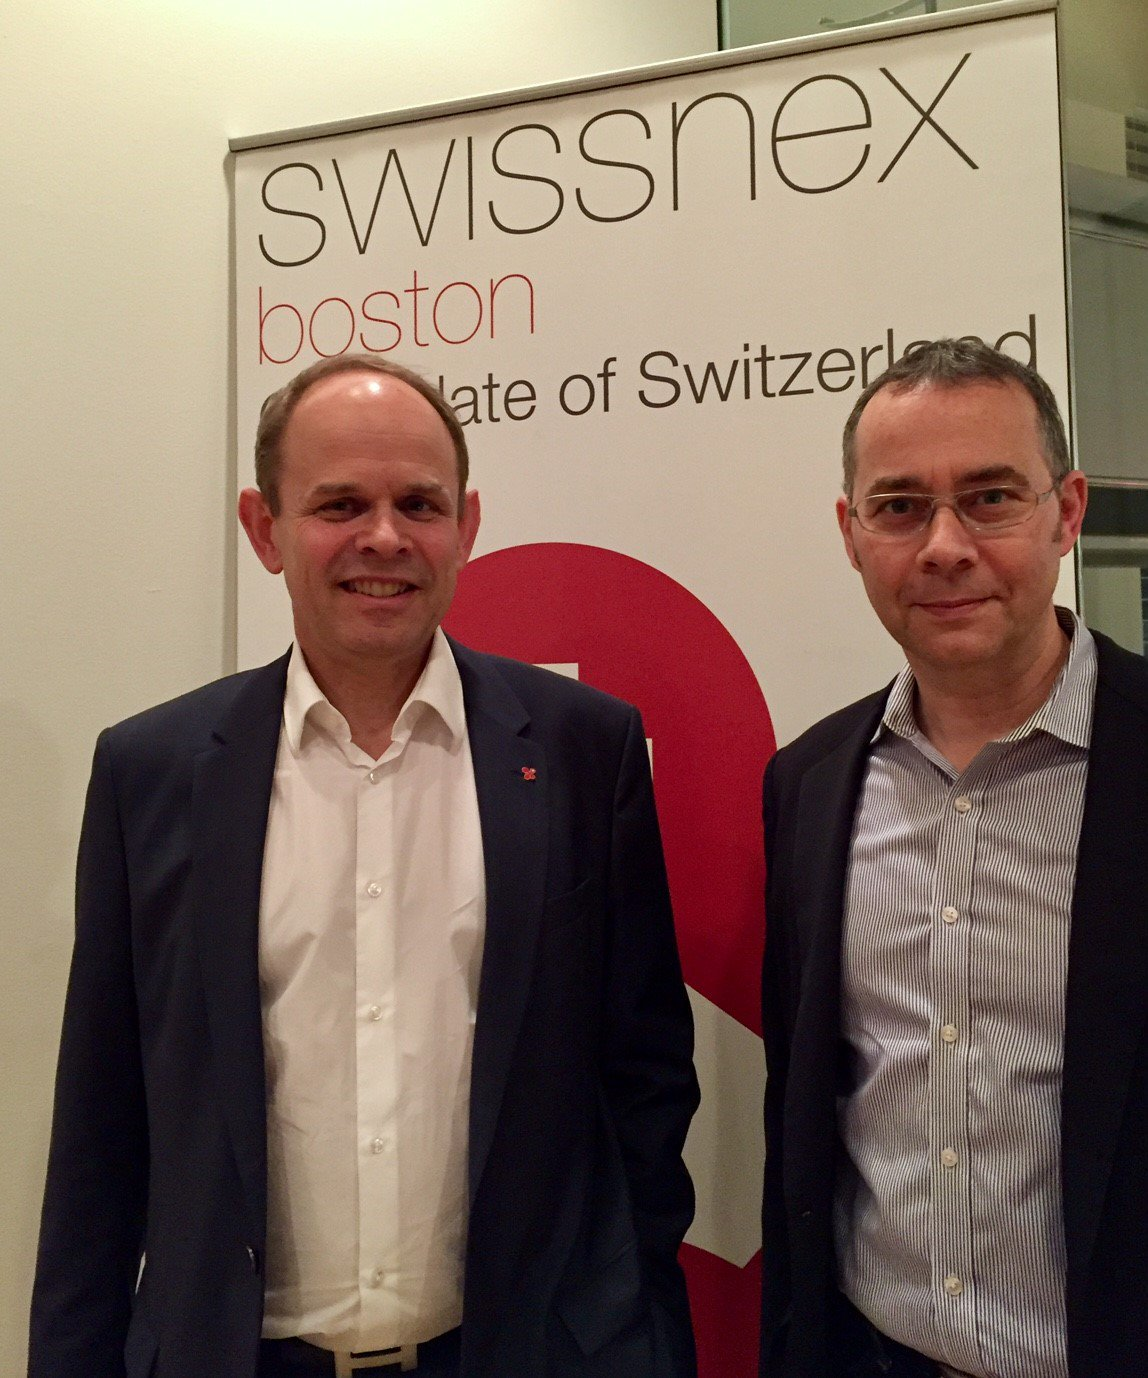 Swissnex Boston